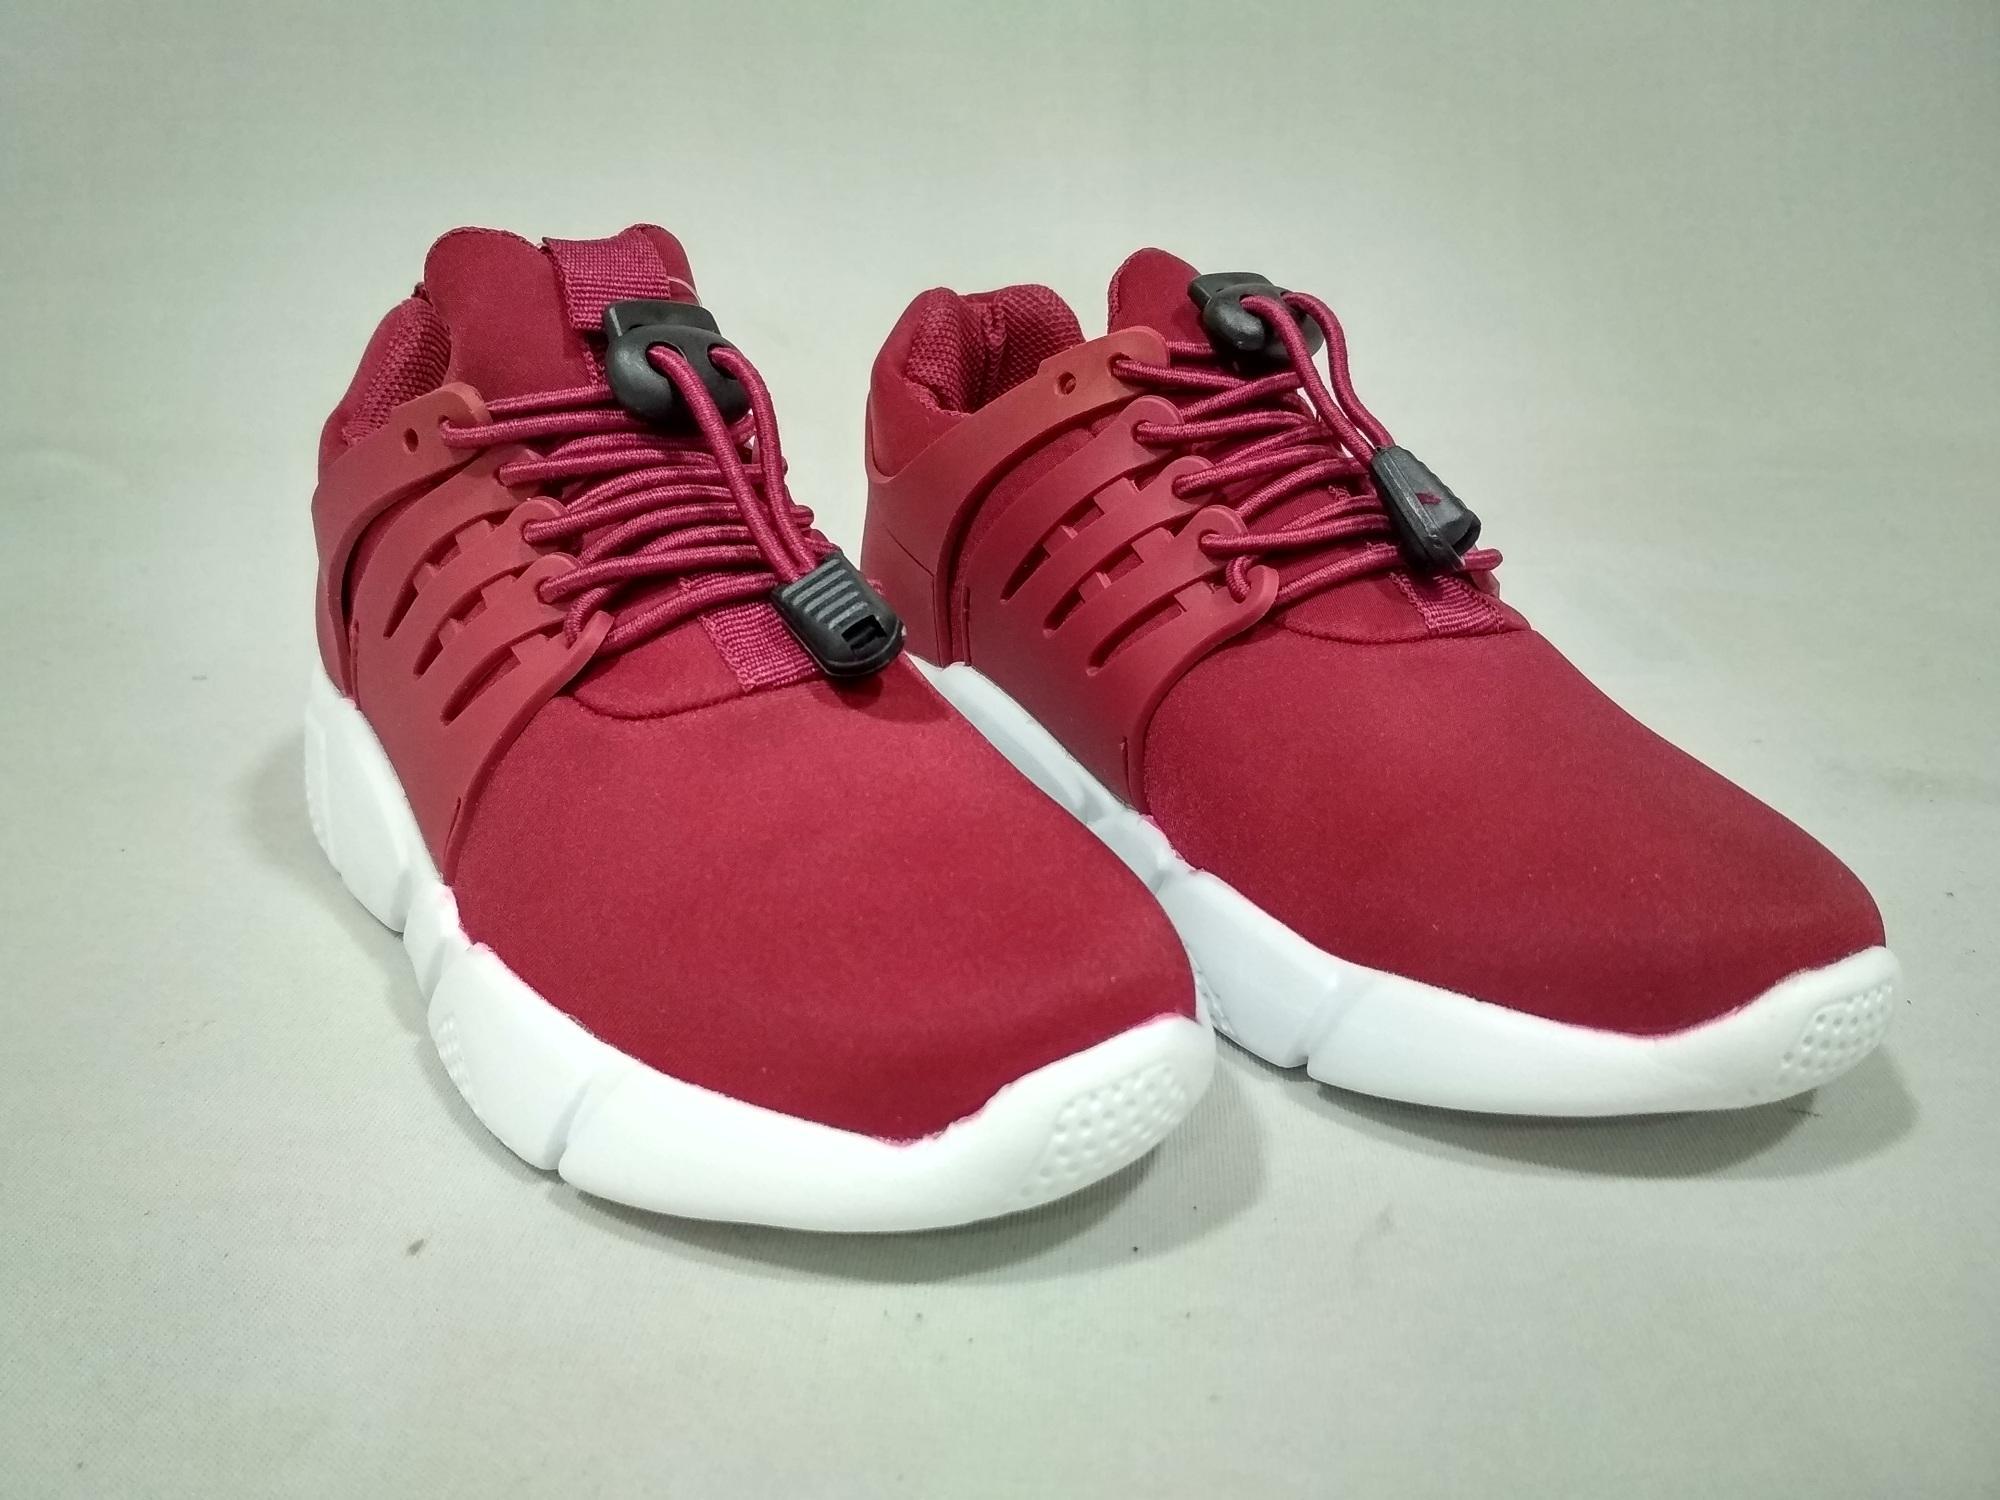 Buy Sell Cheapest Sepatu Kids Sneakers Best Quality Product Deals Ardiles Rosella Hitam Putih Import Mk71 Maroon